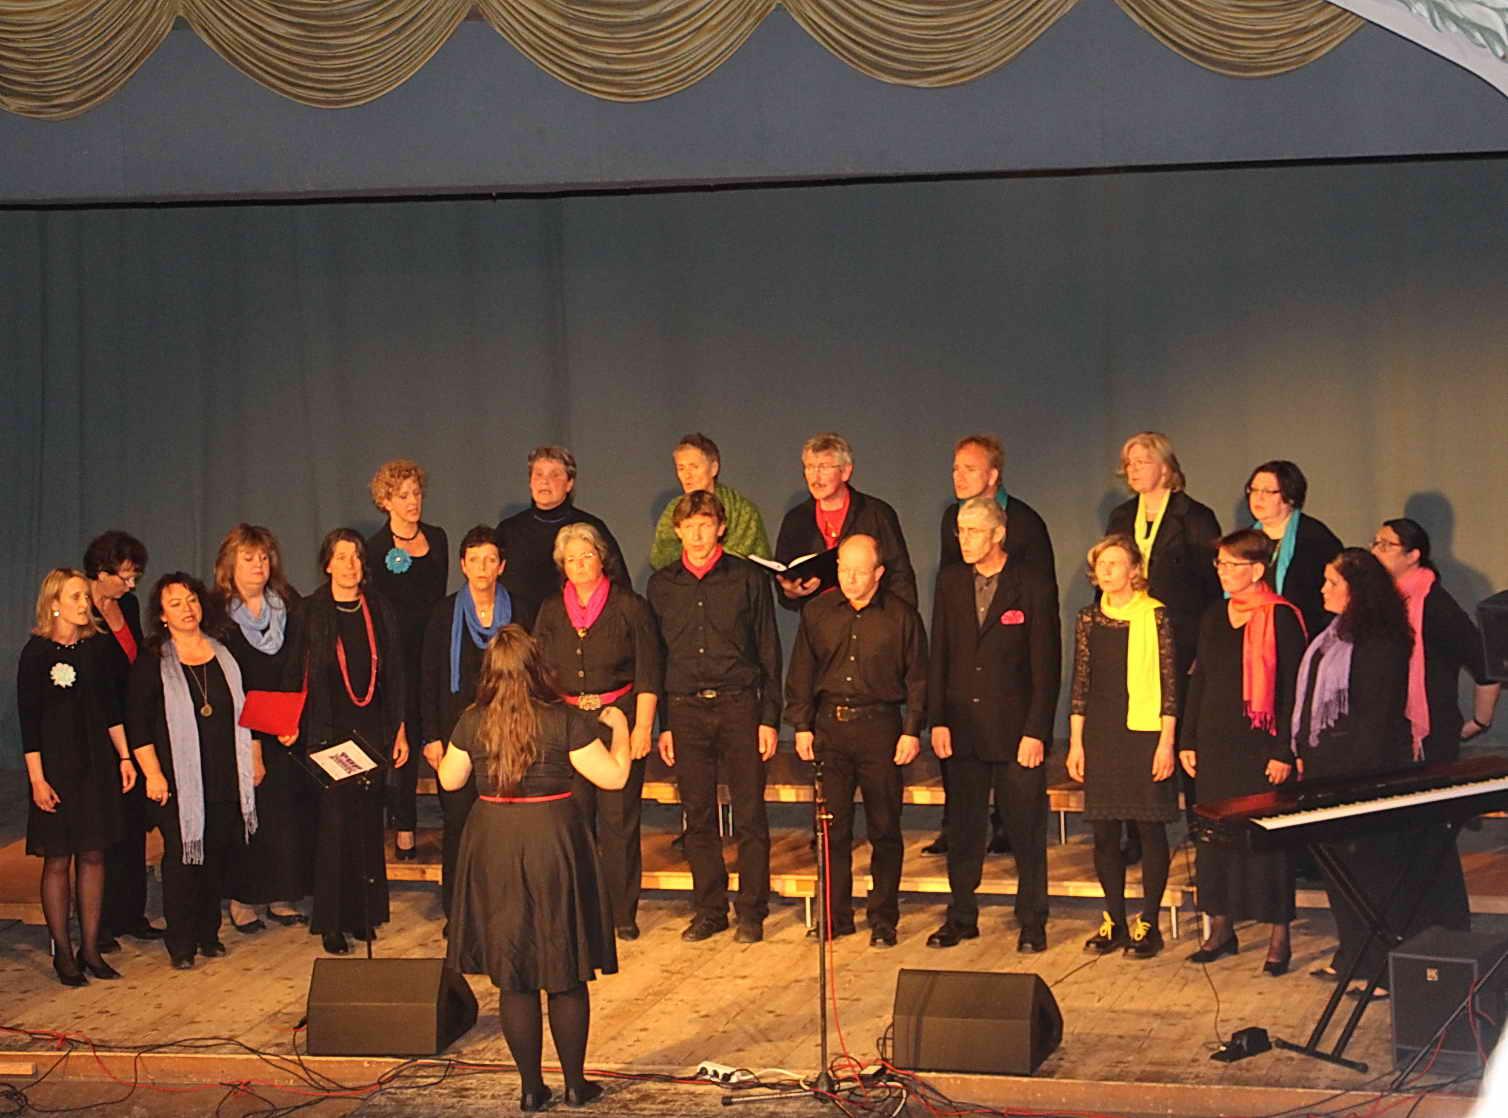 Chor Mundwerk Hausham, Melinda Dzierzon